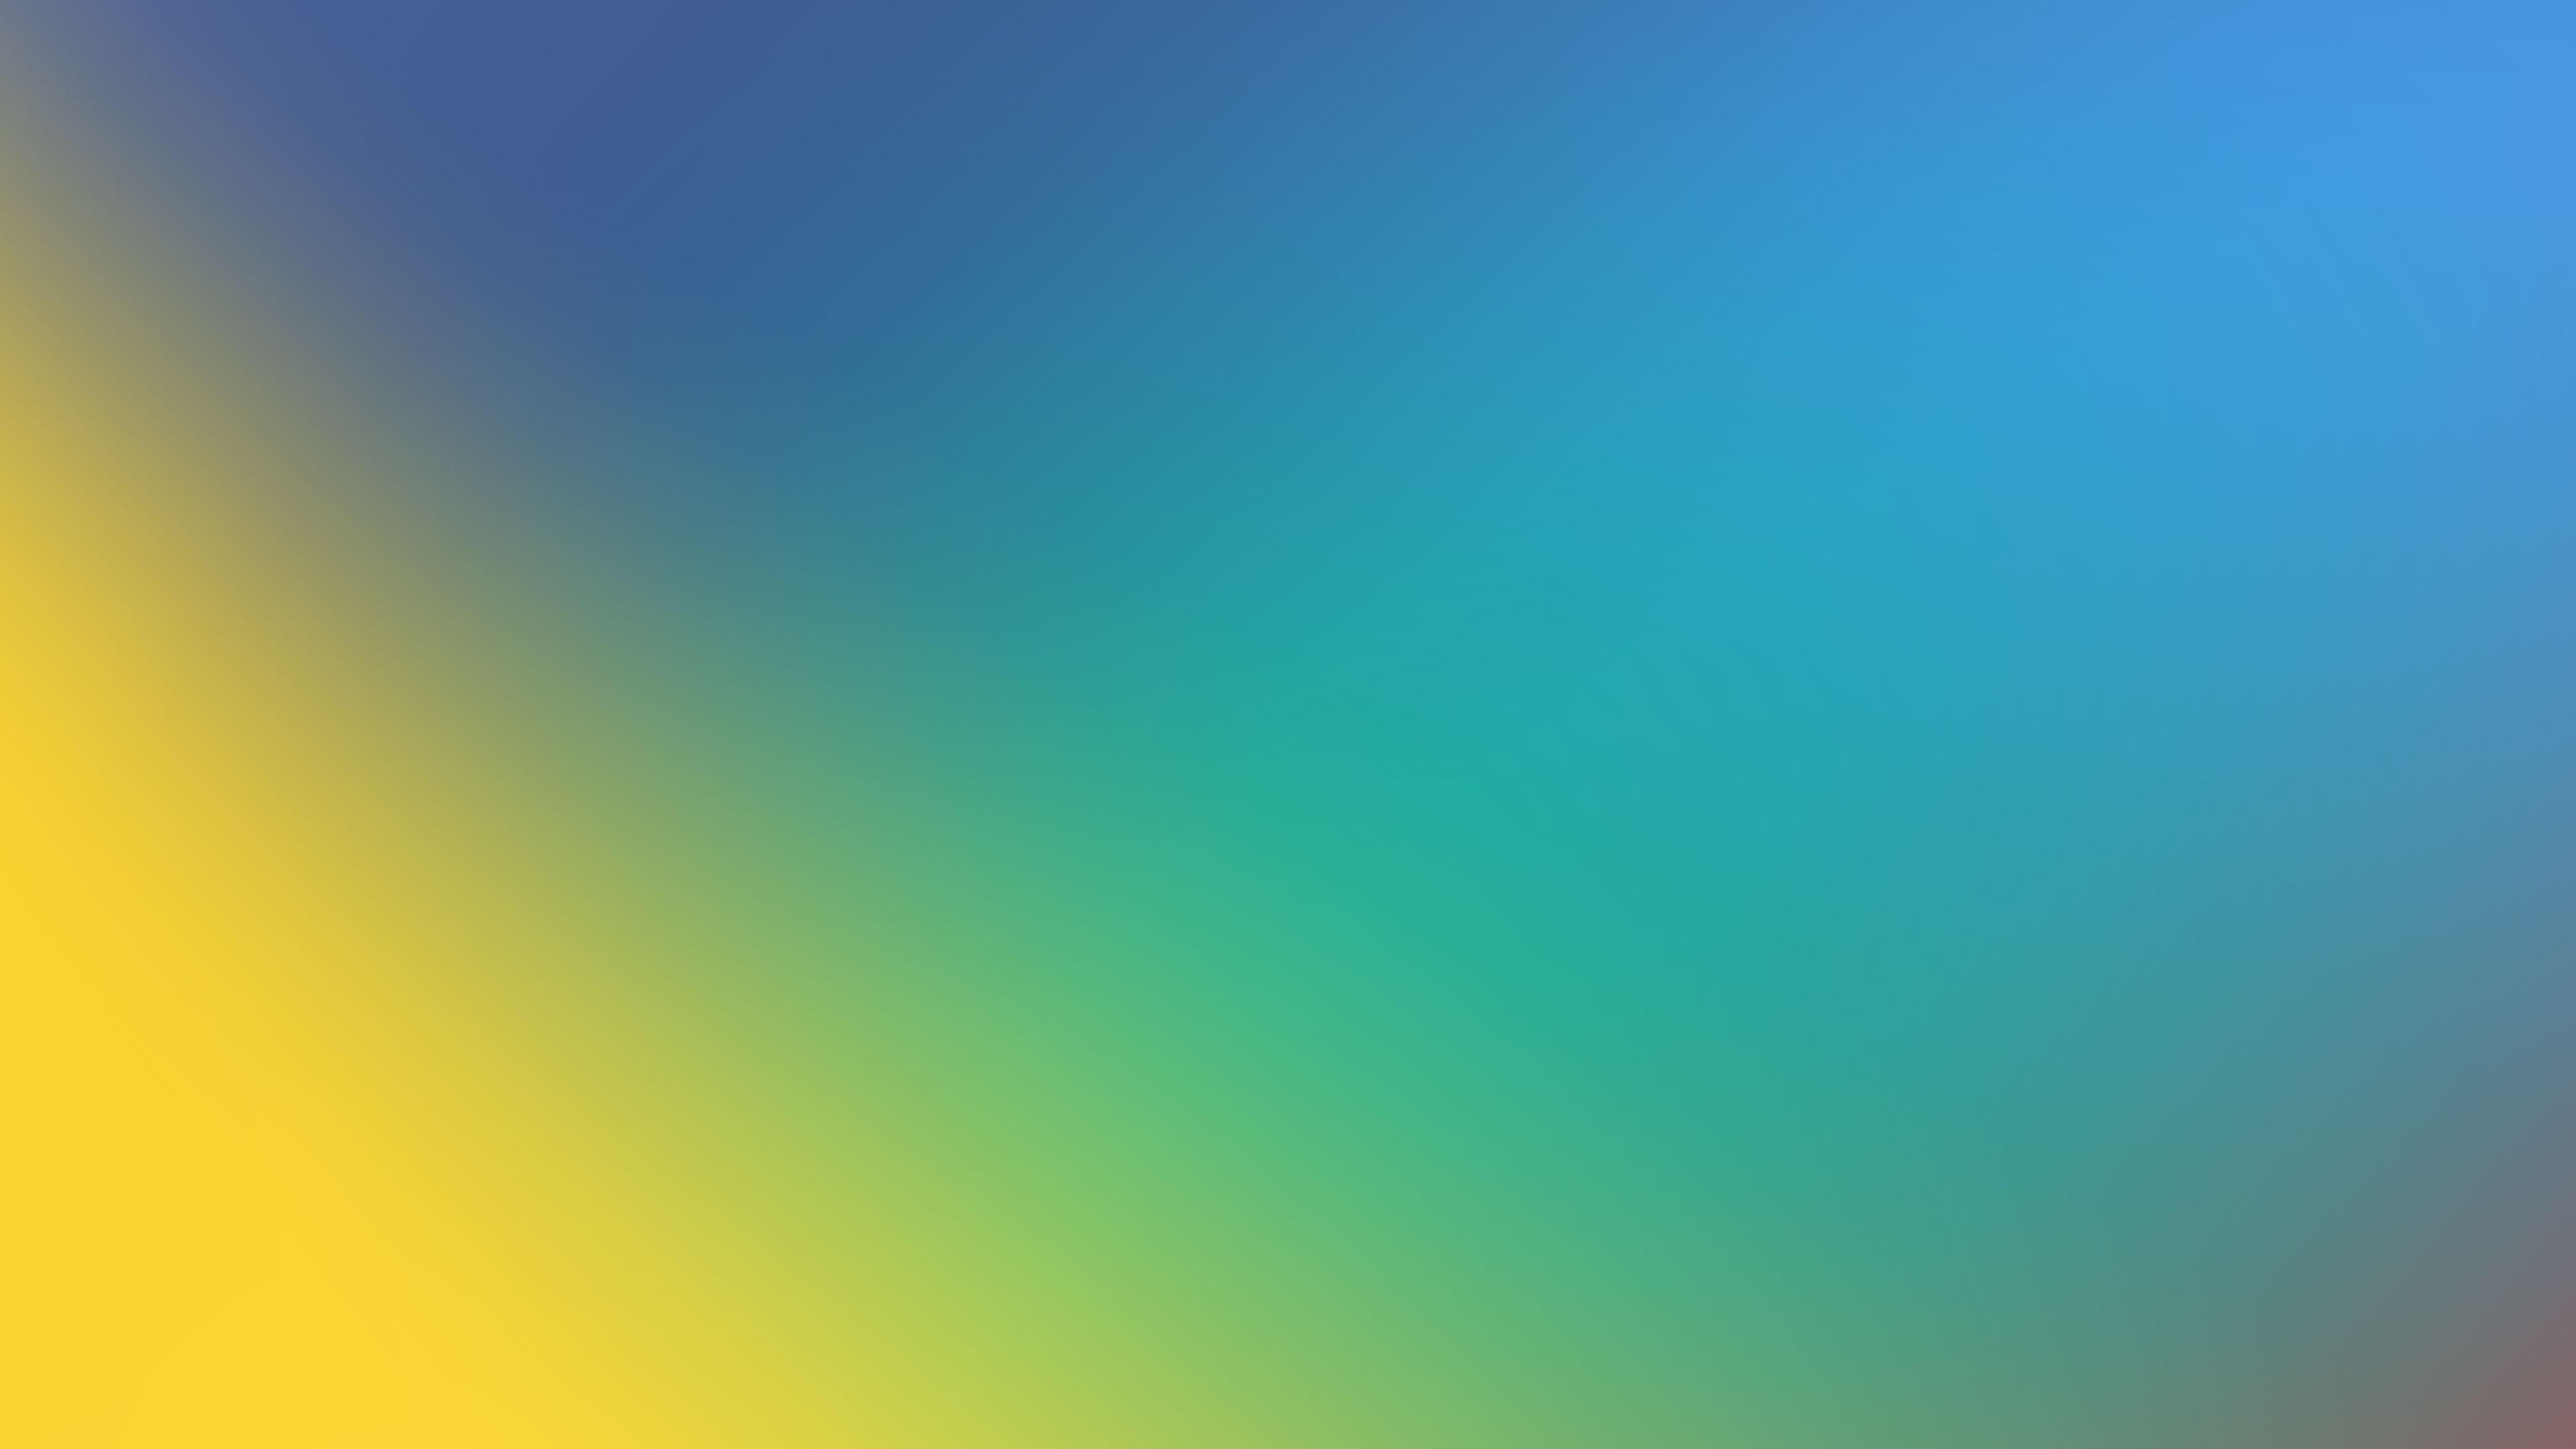 Res: 3840x2160, Minimal / Gradient Wallpaper